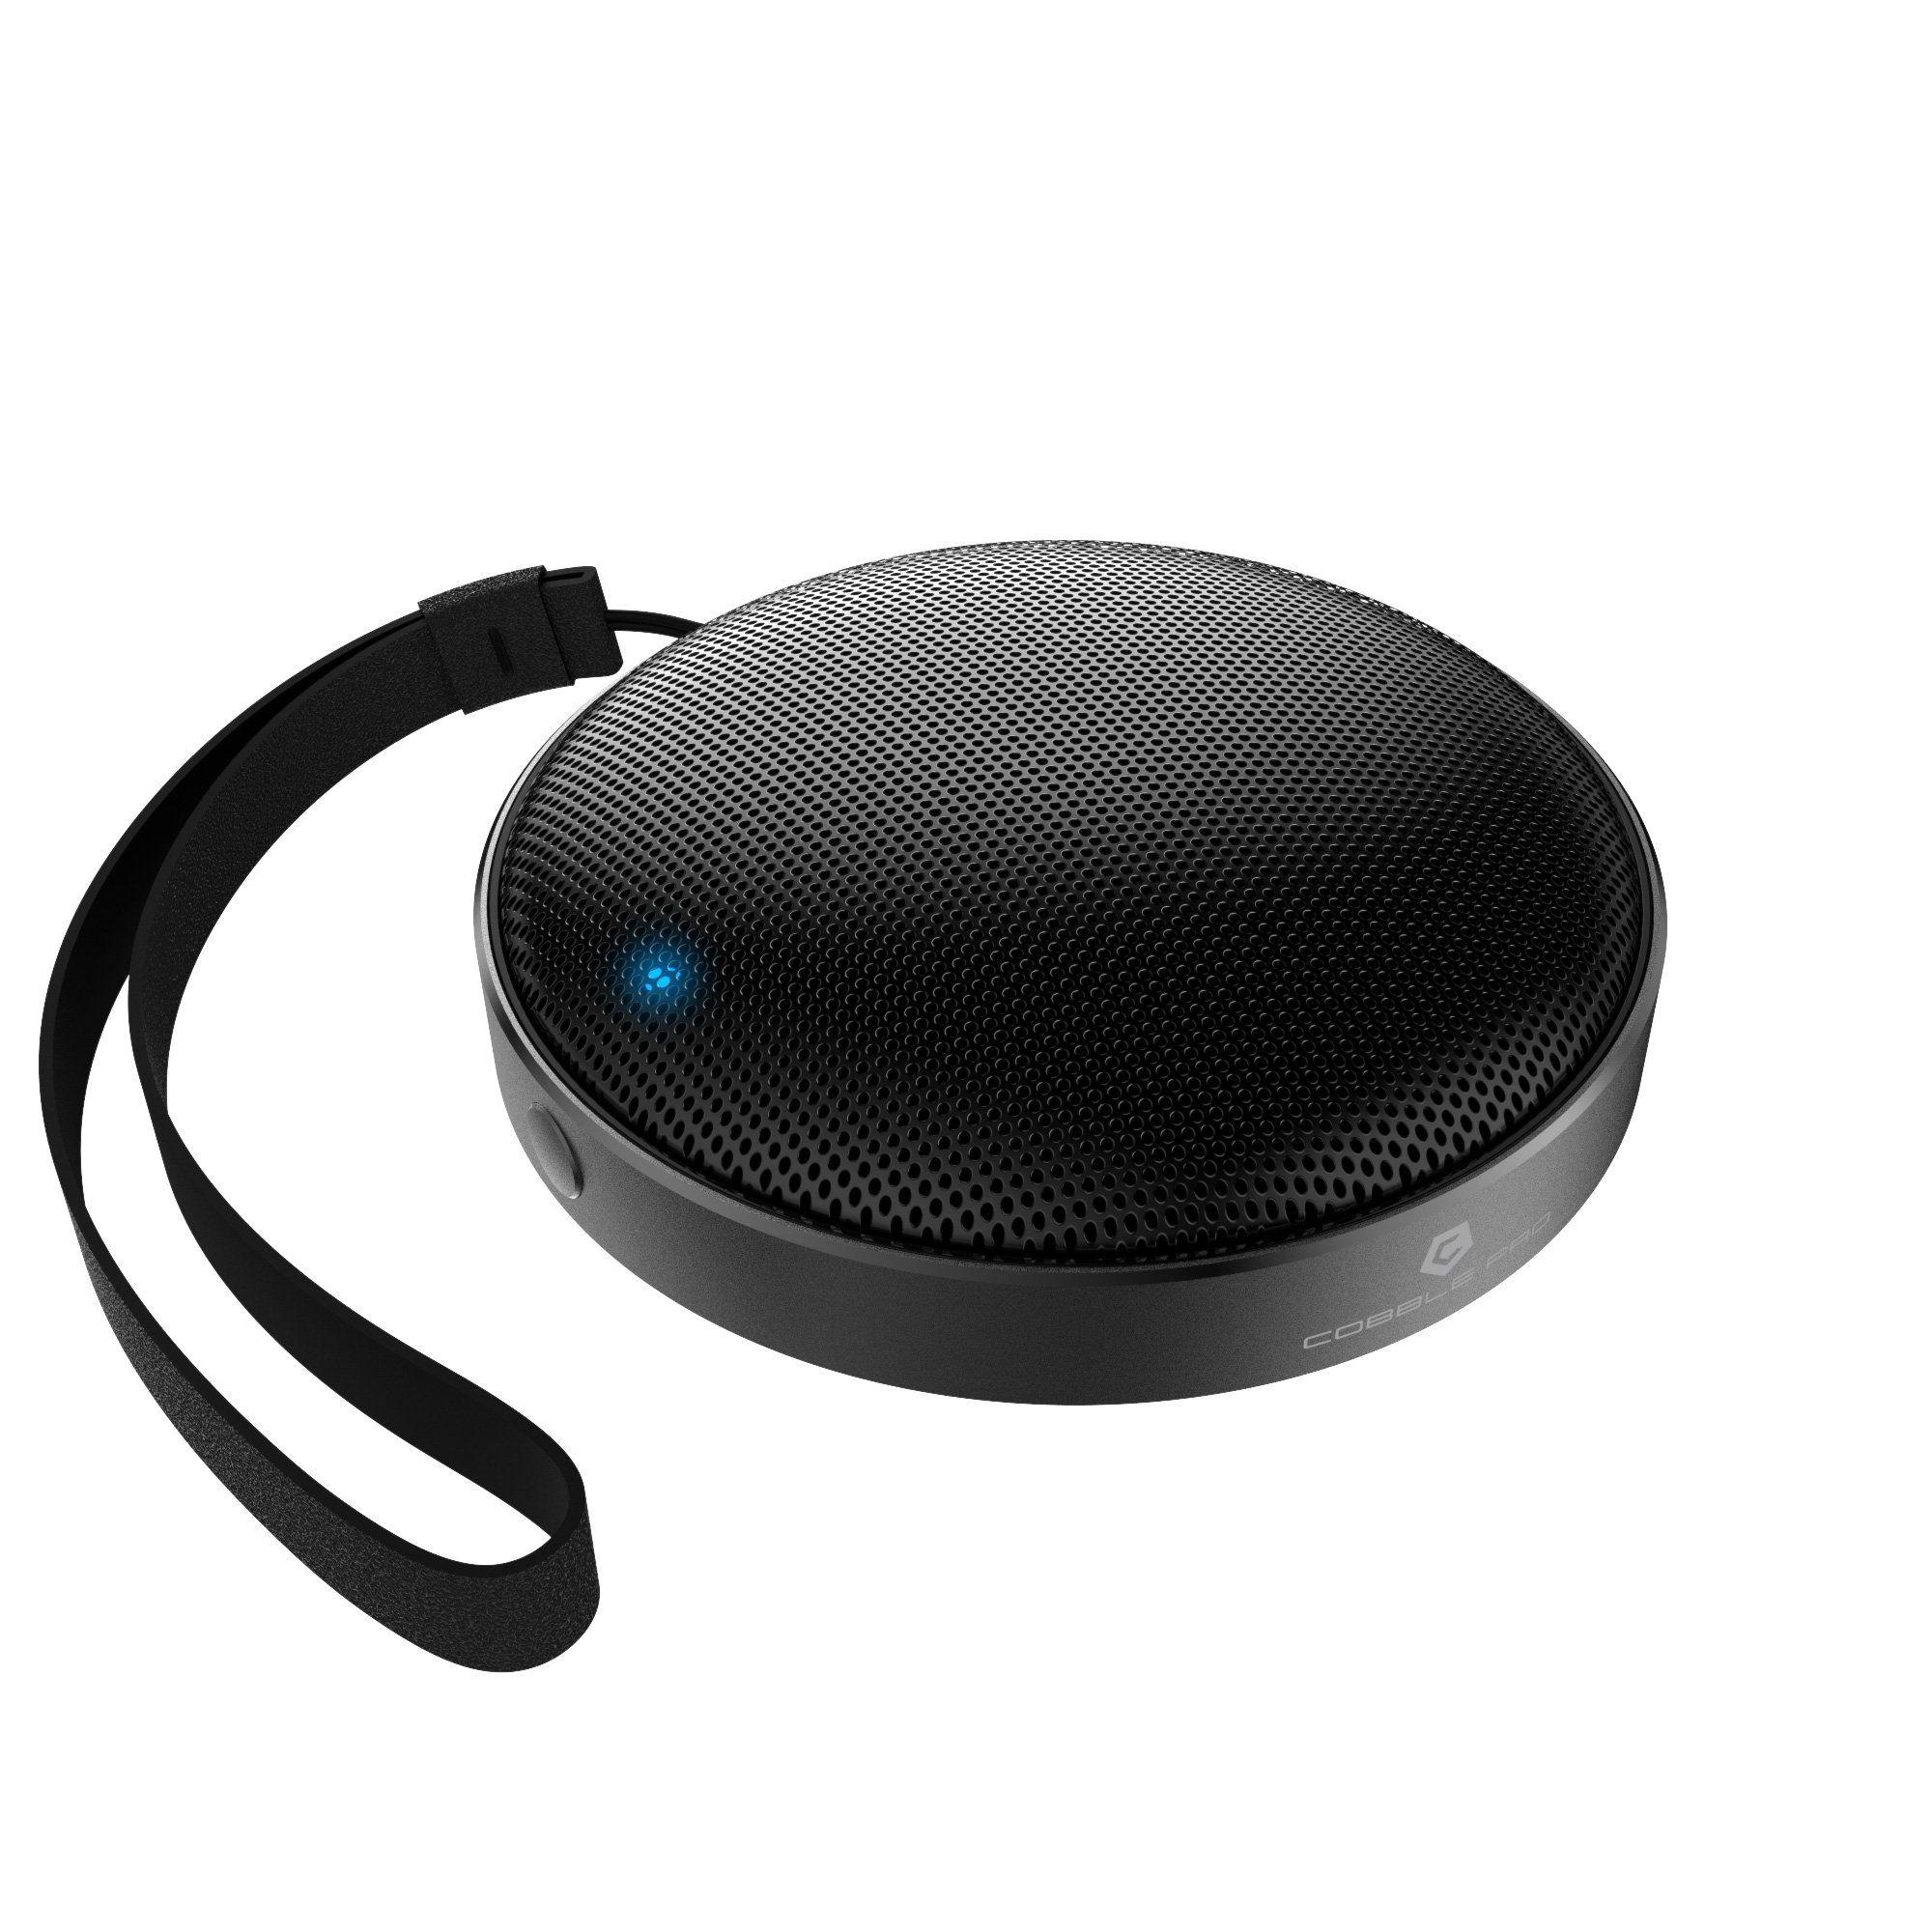 Cobble Pro Universal Sports, Outdoor Bluetooth Earbuds Wireless Headset / Earphones / Speaker - True Wireless Earphones, Black (For Samsung Galaxy S9 S9+ Note 8 / iPhone X 8 7 Plus / Sony Xperia XZ2)